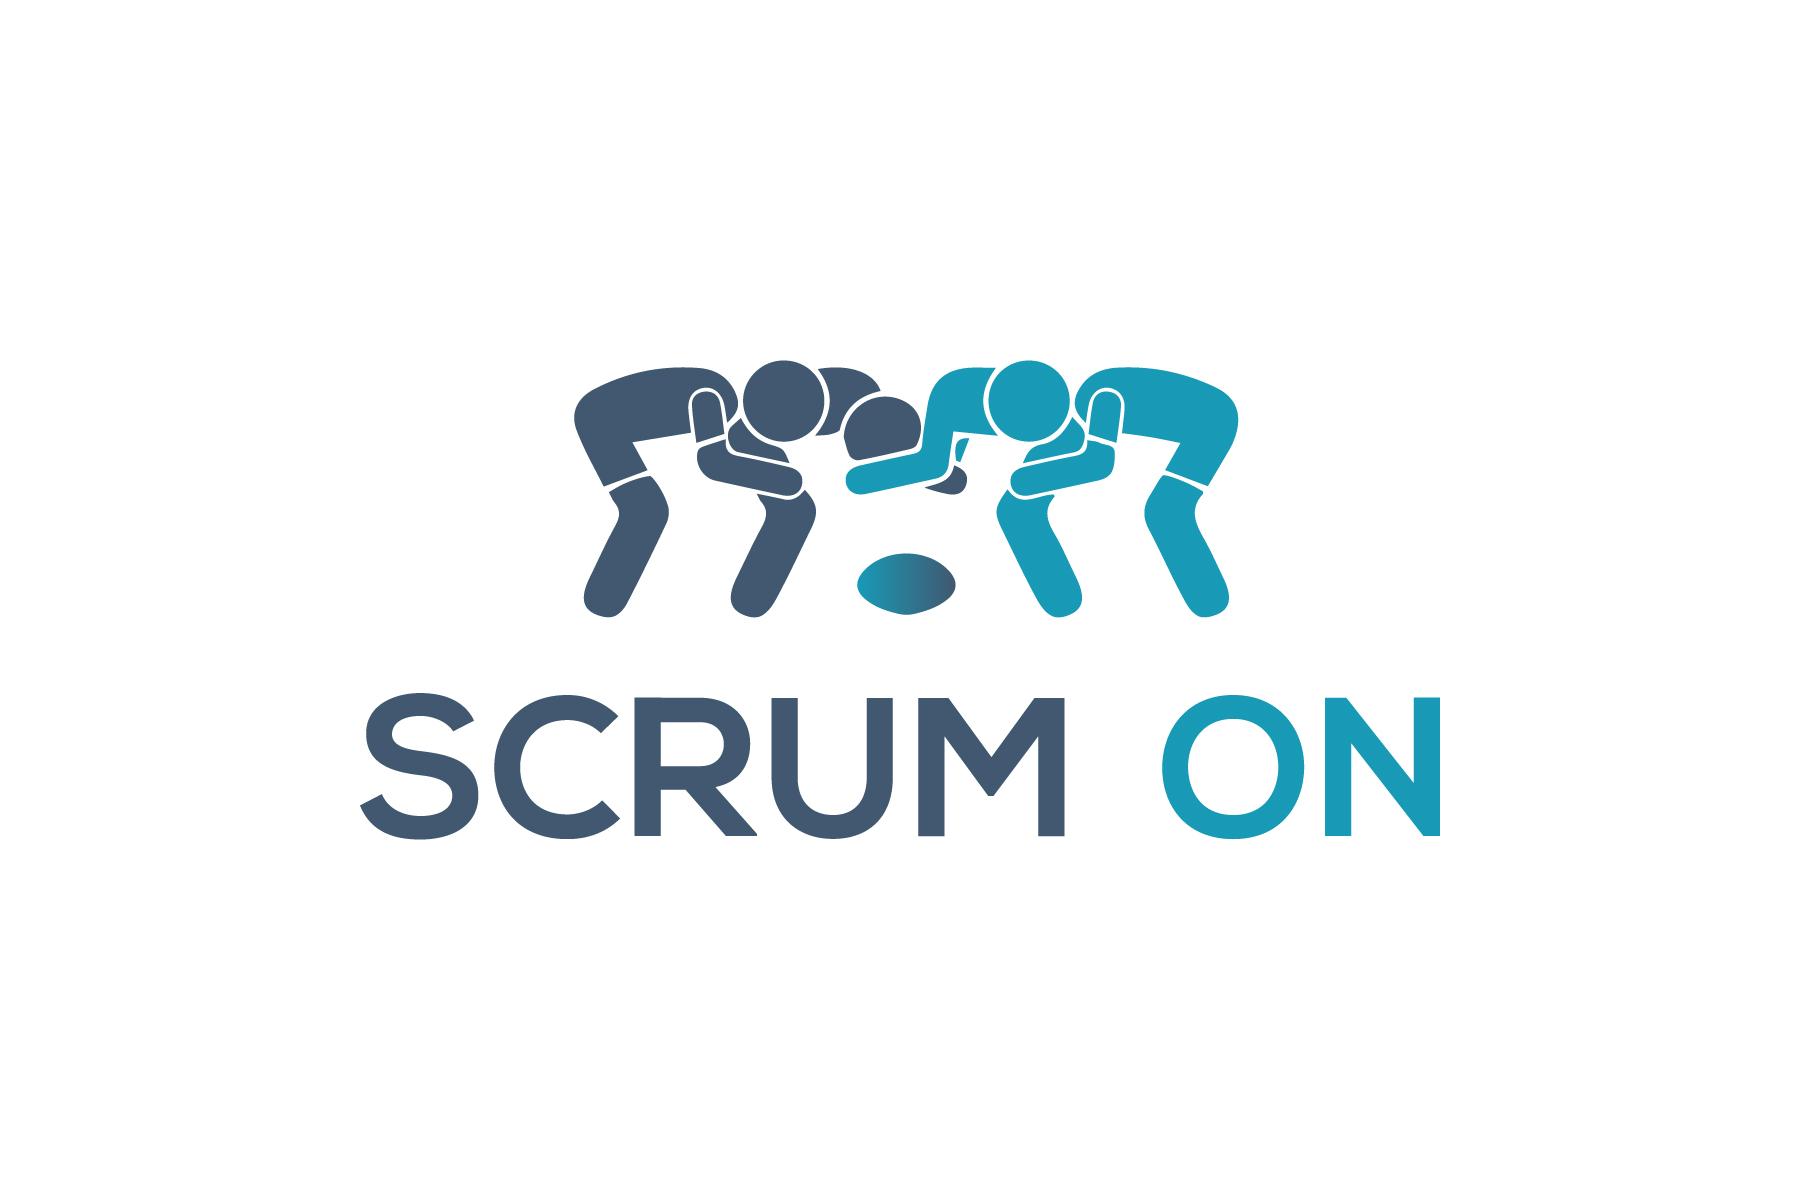 Scrum On